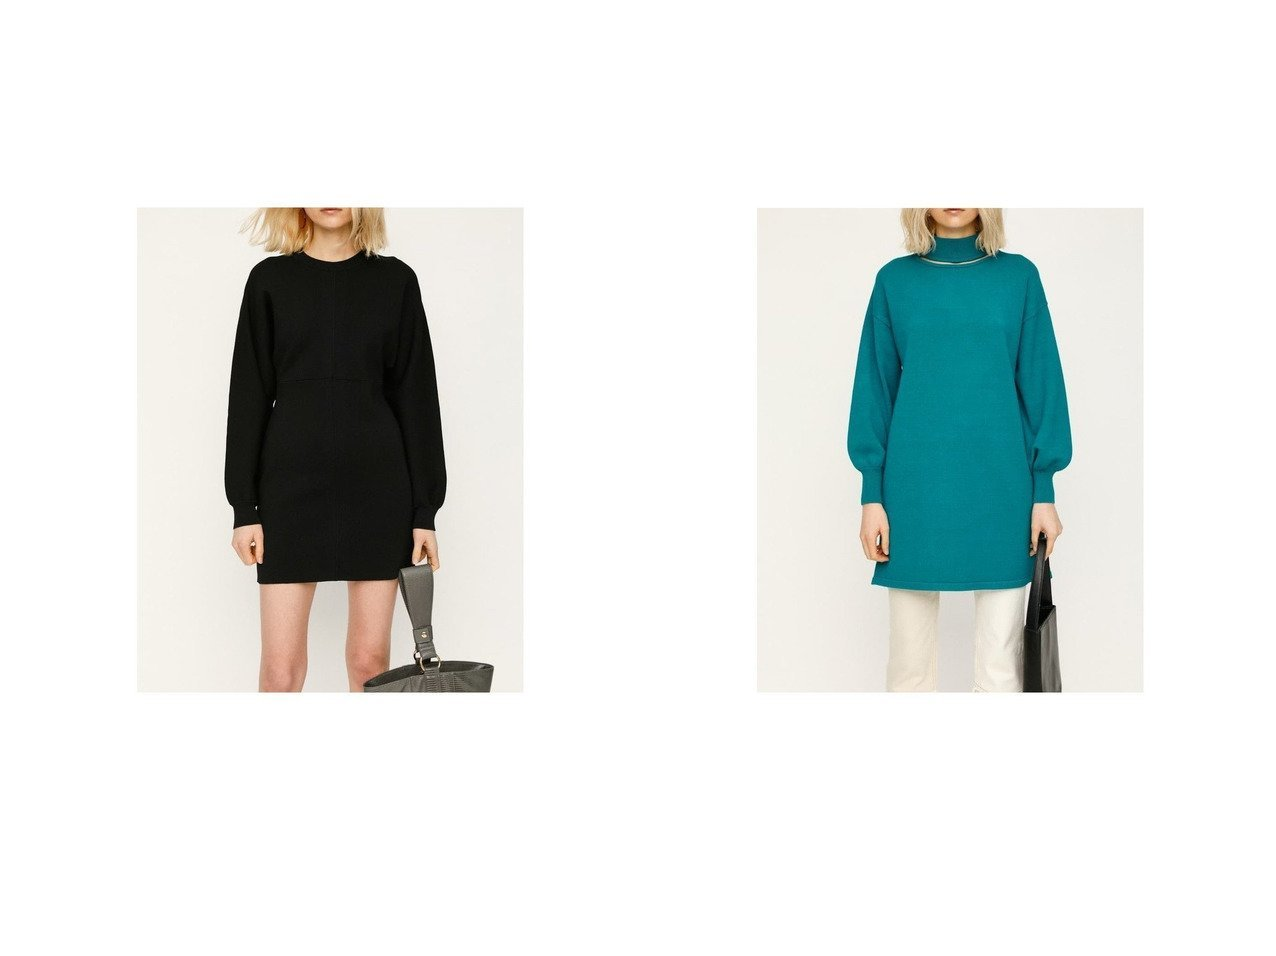 【SLY/スライ】のDOLMAN SLEEVE MILANO RIB ワンピース&CUT OUT OVER HG ワンピース TQ ワンピース・ドレスのおすすめ!人気、トレンド・レディースファッションの通販 おすすめで人気の流行・トレンド、ファッションの通販商品 メンズファッション・キッズファッション・インテリア・家具・レディースファッション・服の通販 founy(ファニー) https://founy.com/ ファッション Fashion レディースファッション WOMEN ワンピース Dress 2021年 2021 2021 春夏 S/S SS Spring/Summer 2021 S/S 春夏 SS Spring/Summer 春 Spring  ID:crp329100000015484